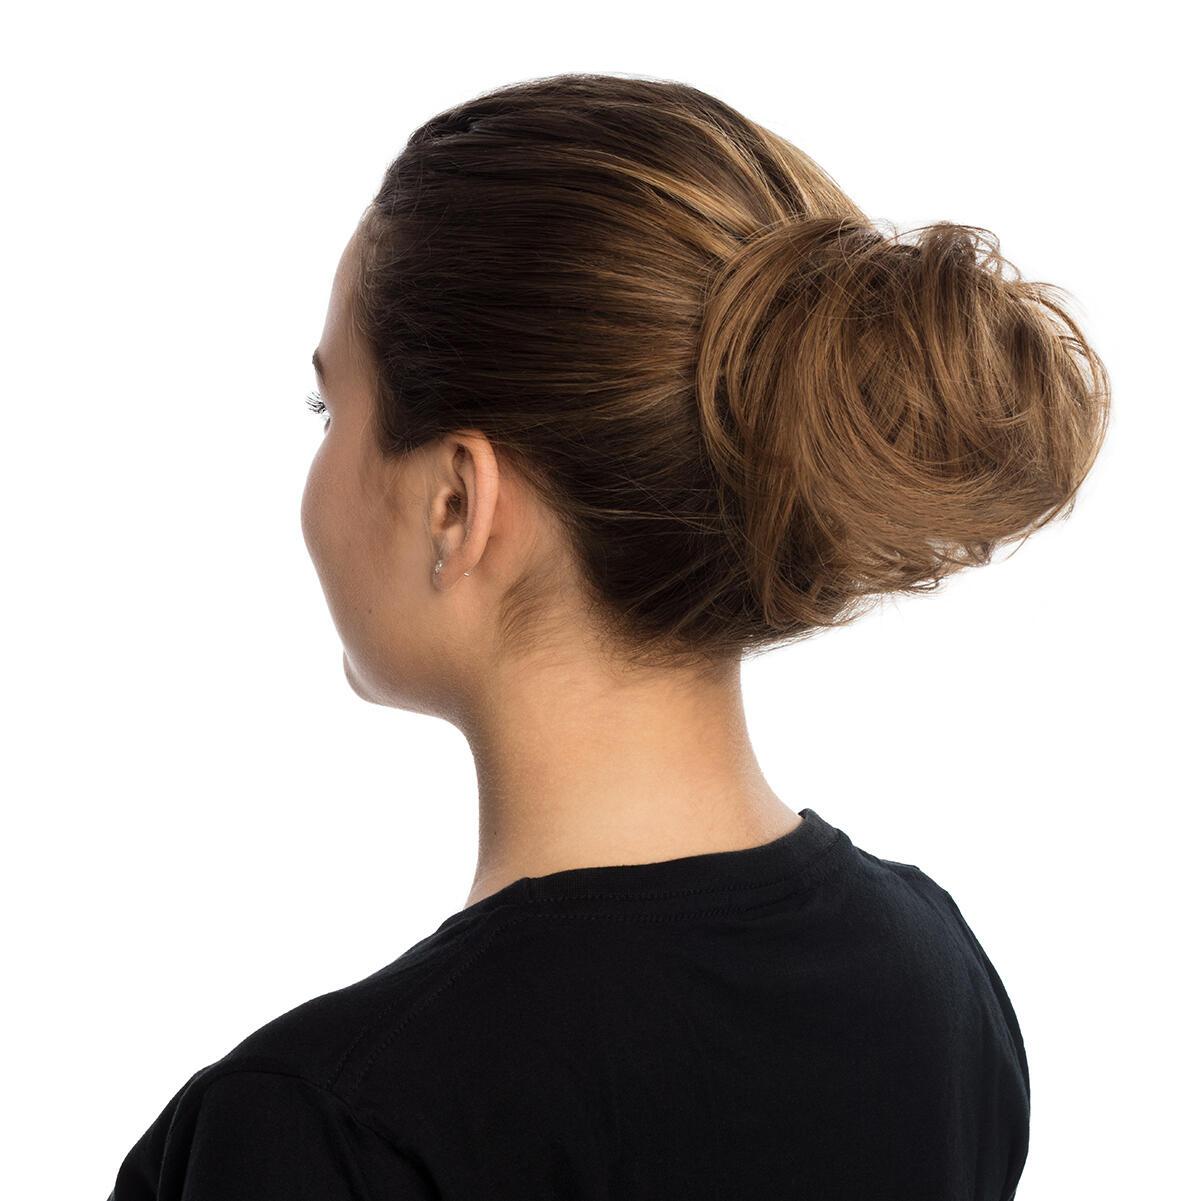 Hair Scrunchie 8.0 Light Golden Blonde 0 cm